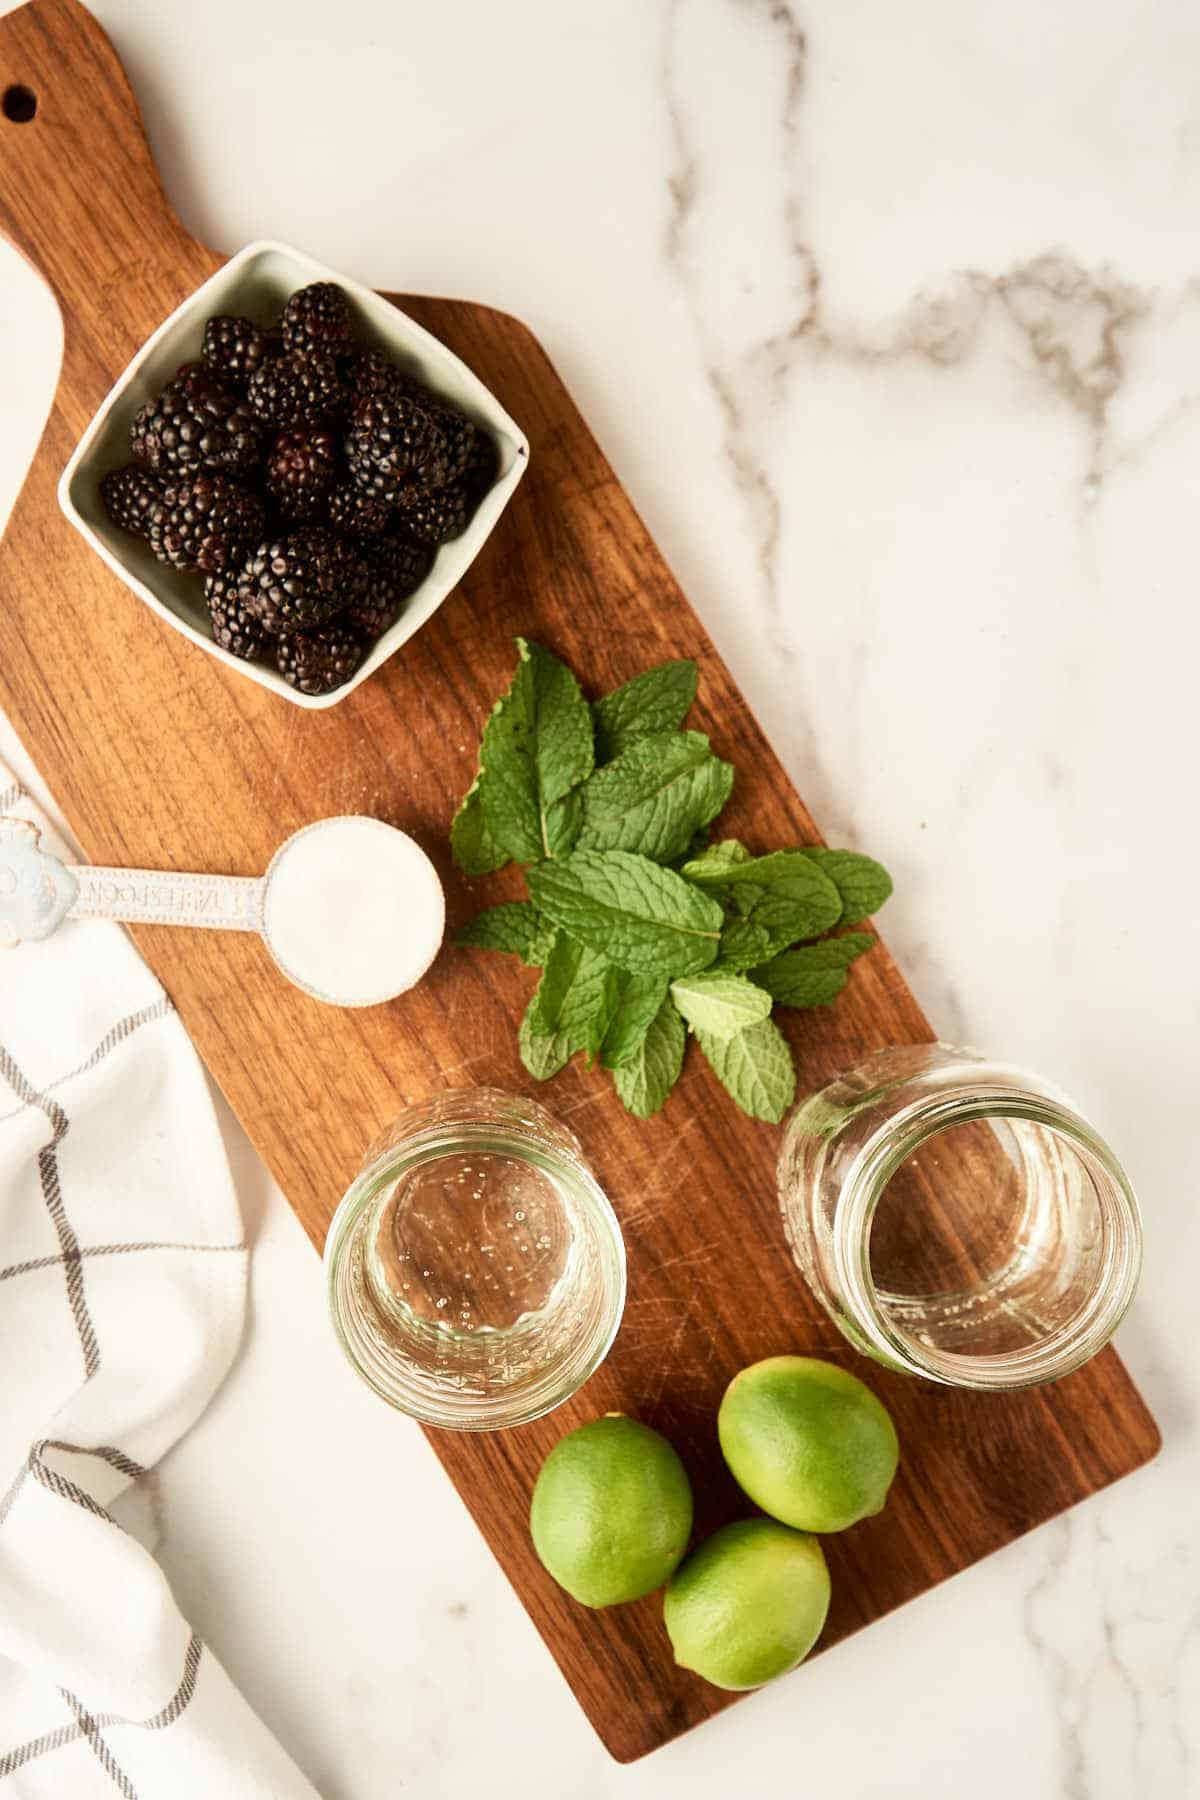 blackberries, rum, club soda, limes, sugar, and mint leaves on wooden cutting board